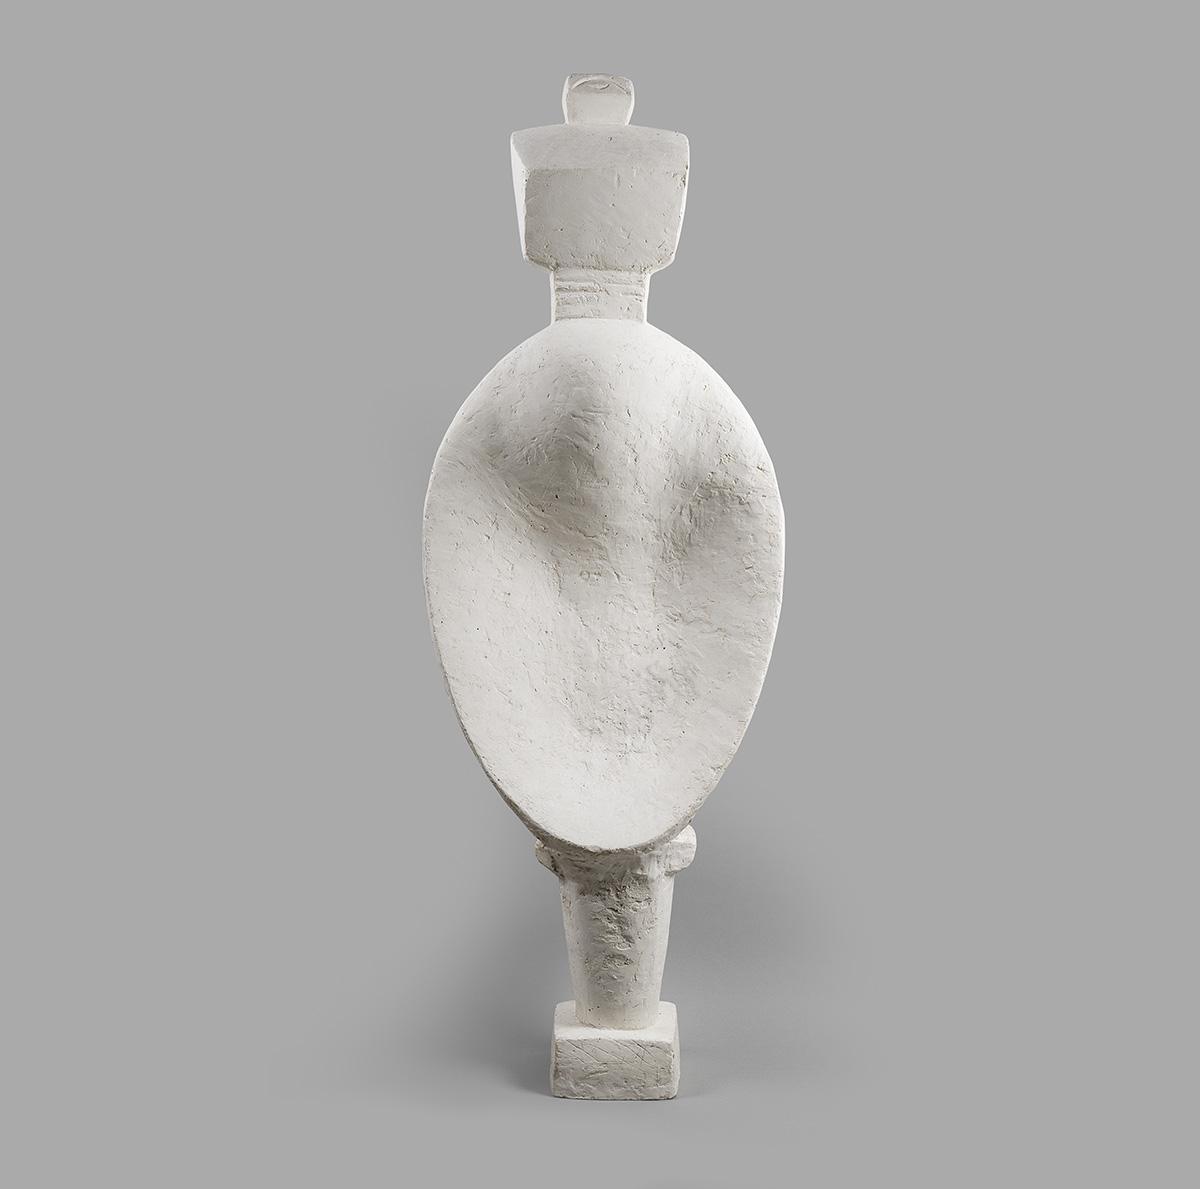 1220 Spoon woman Giacometti1